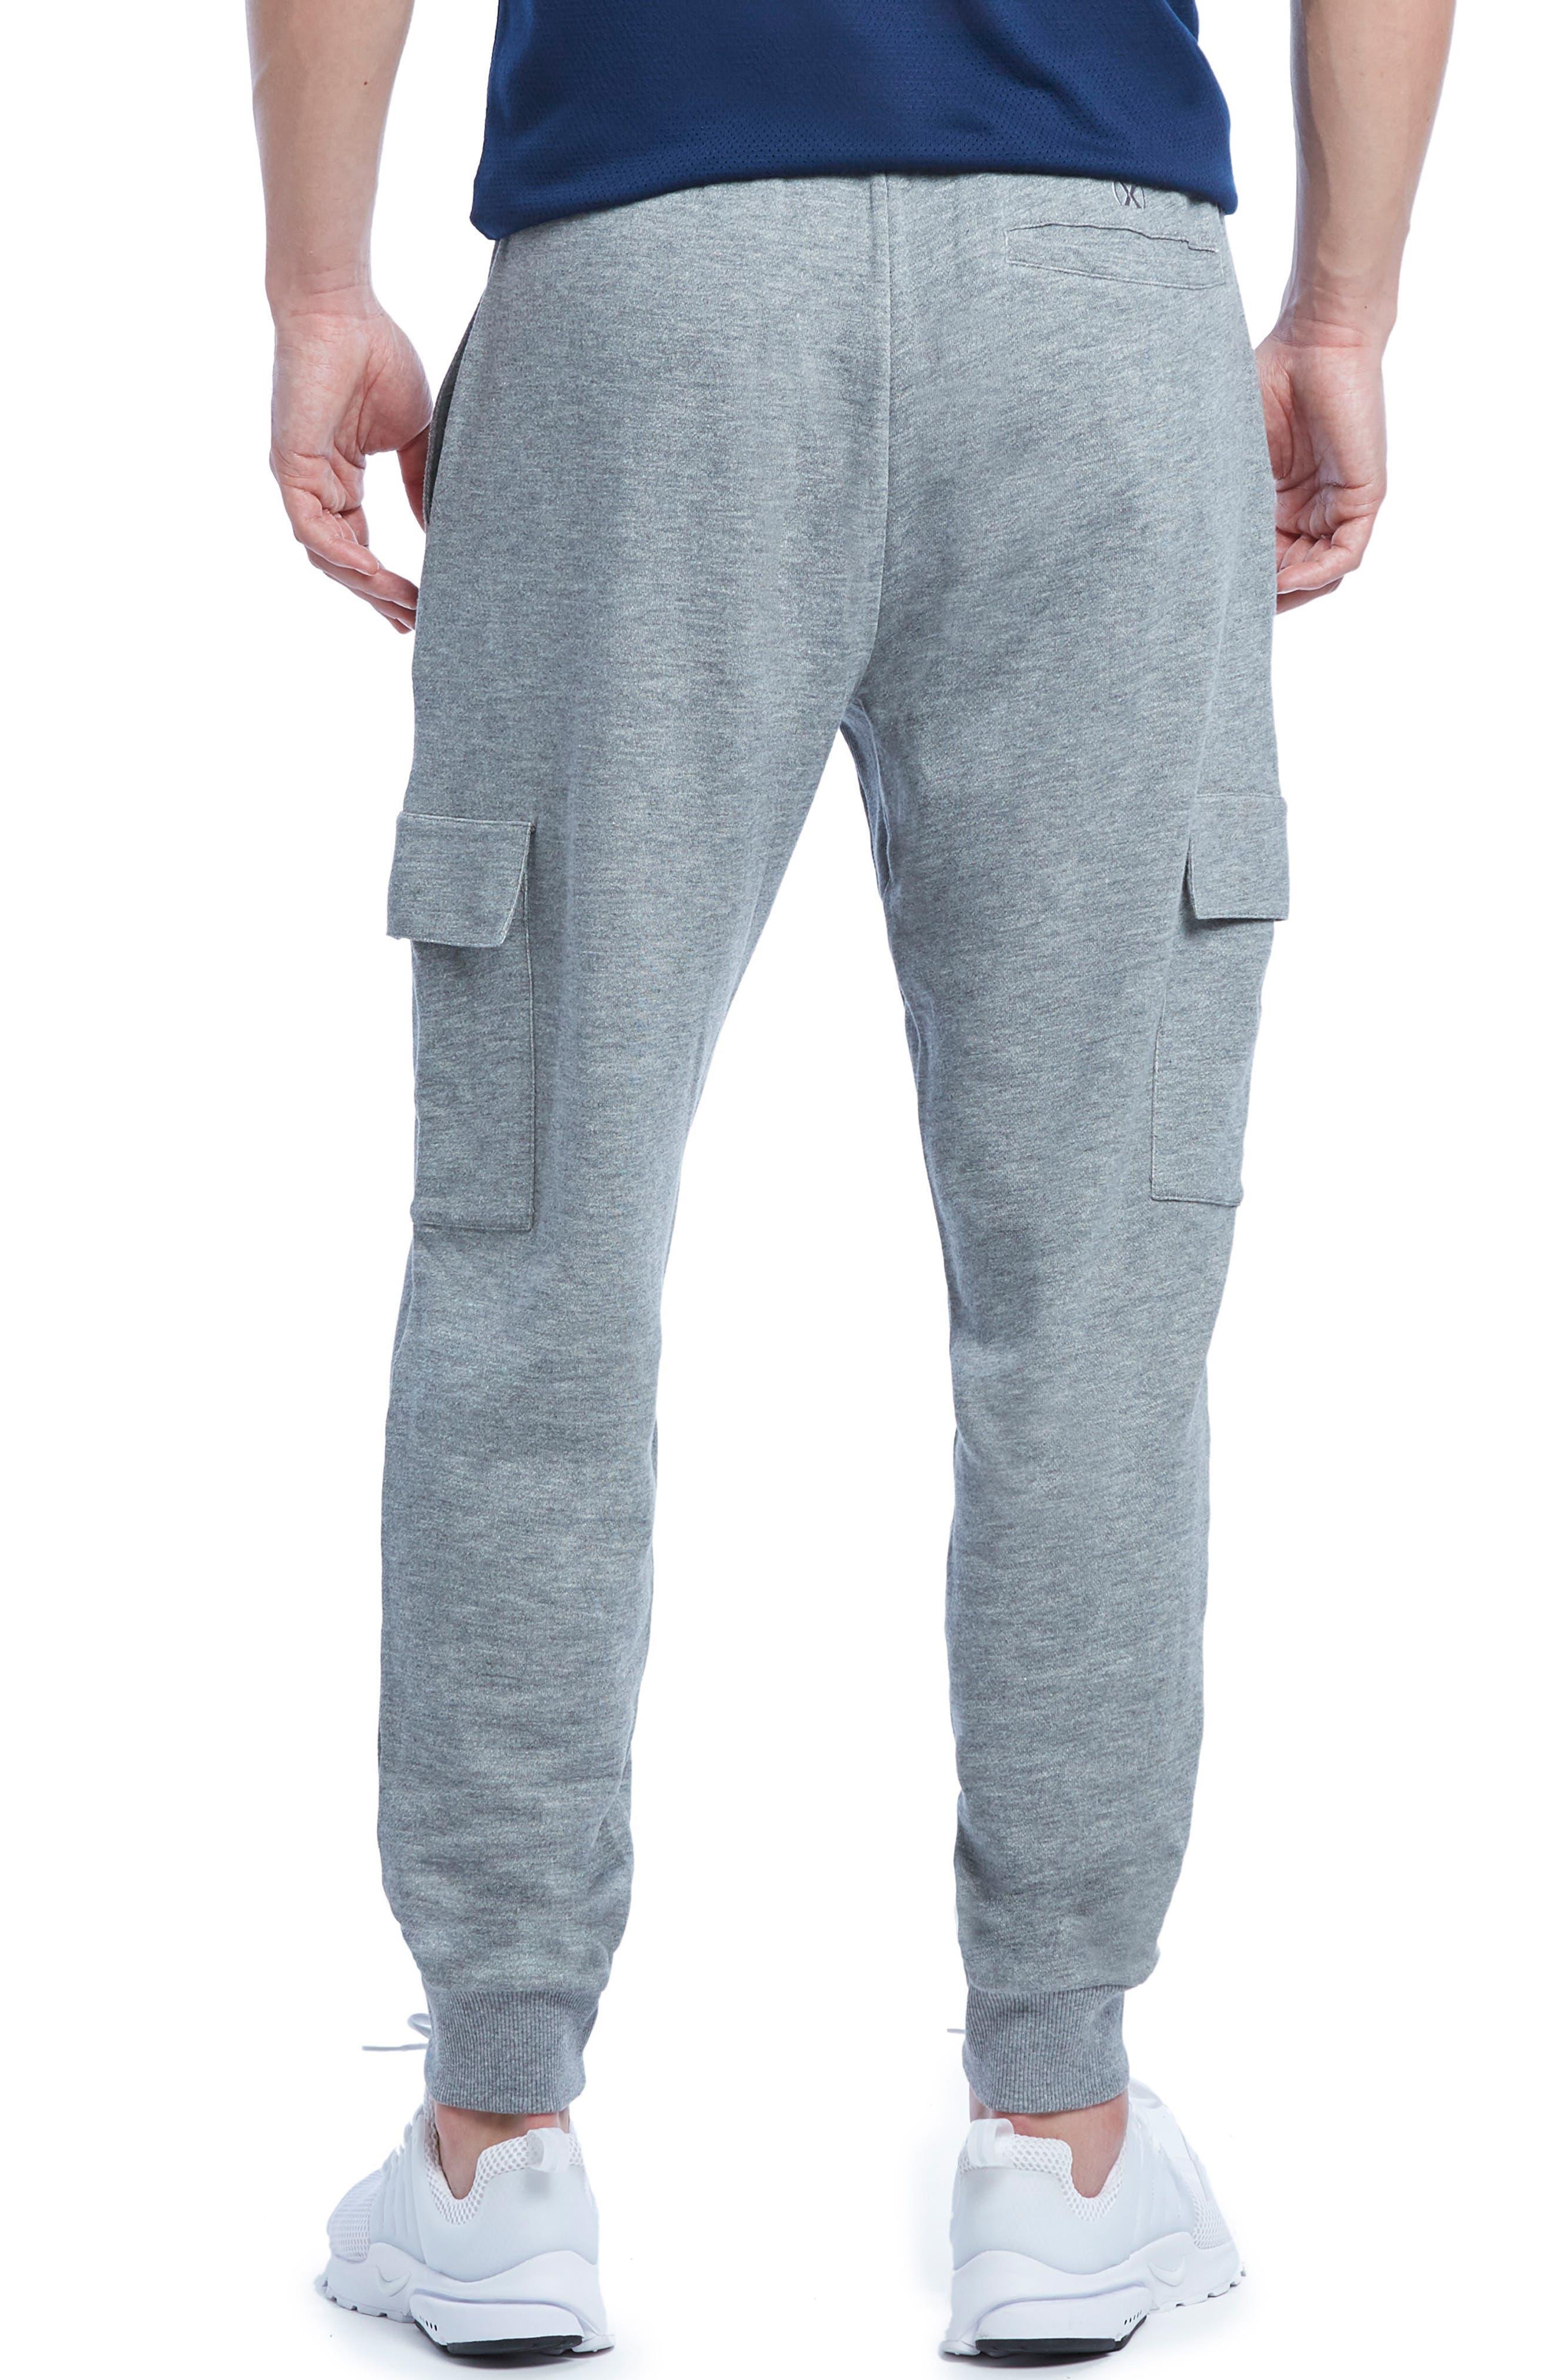 Cotton Blend Cargo Sweatpants,                             Alternate thumbnail 2, color,                             Medium Grey Heather